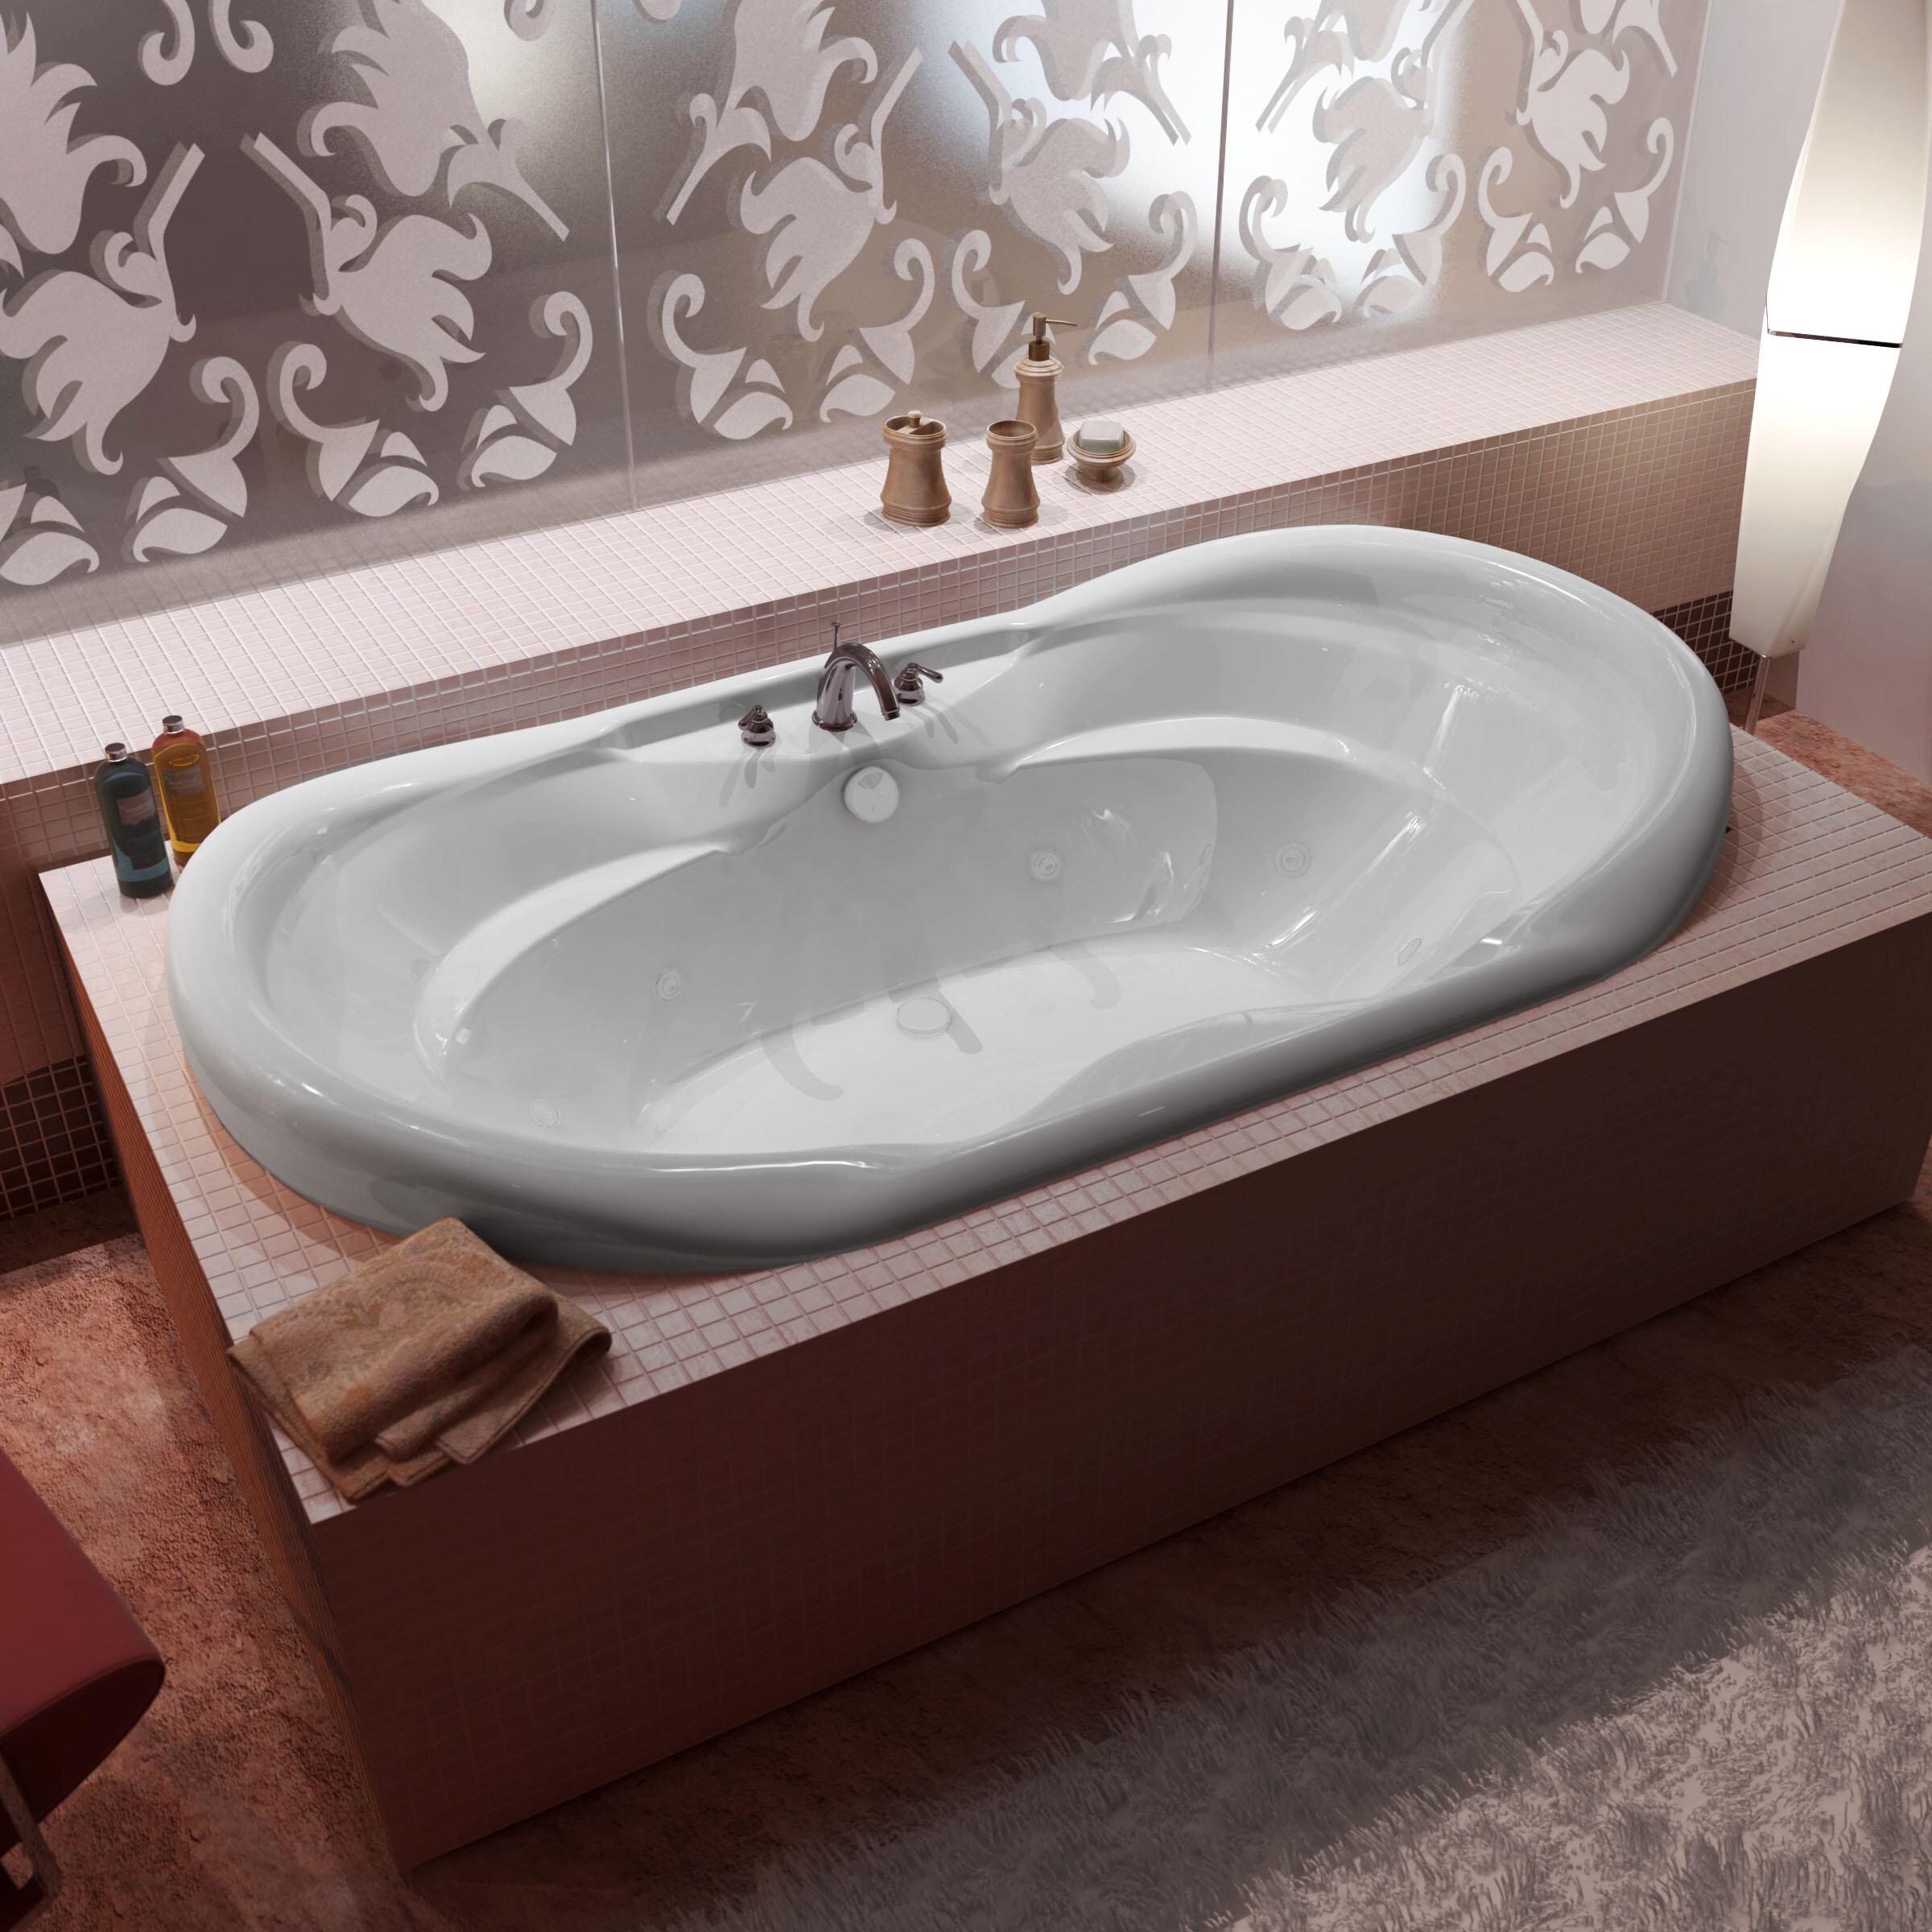 Spa Escapes Antigua 71 X 41 Whirlpool Bathtub With Center Drain Wayfair